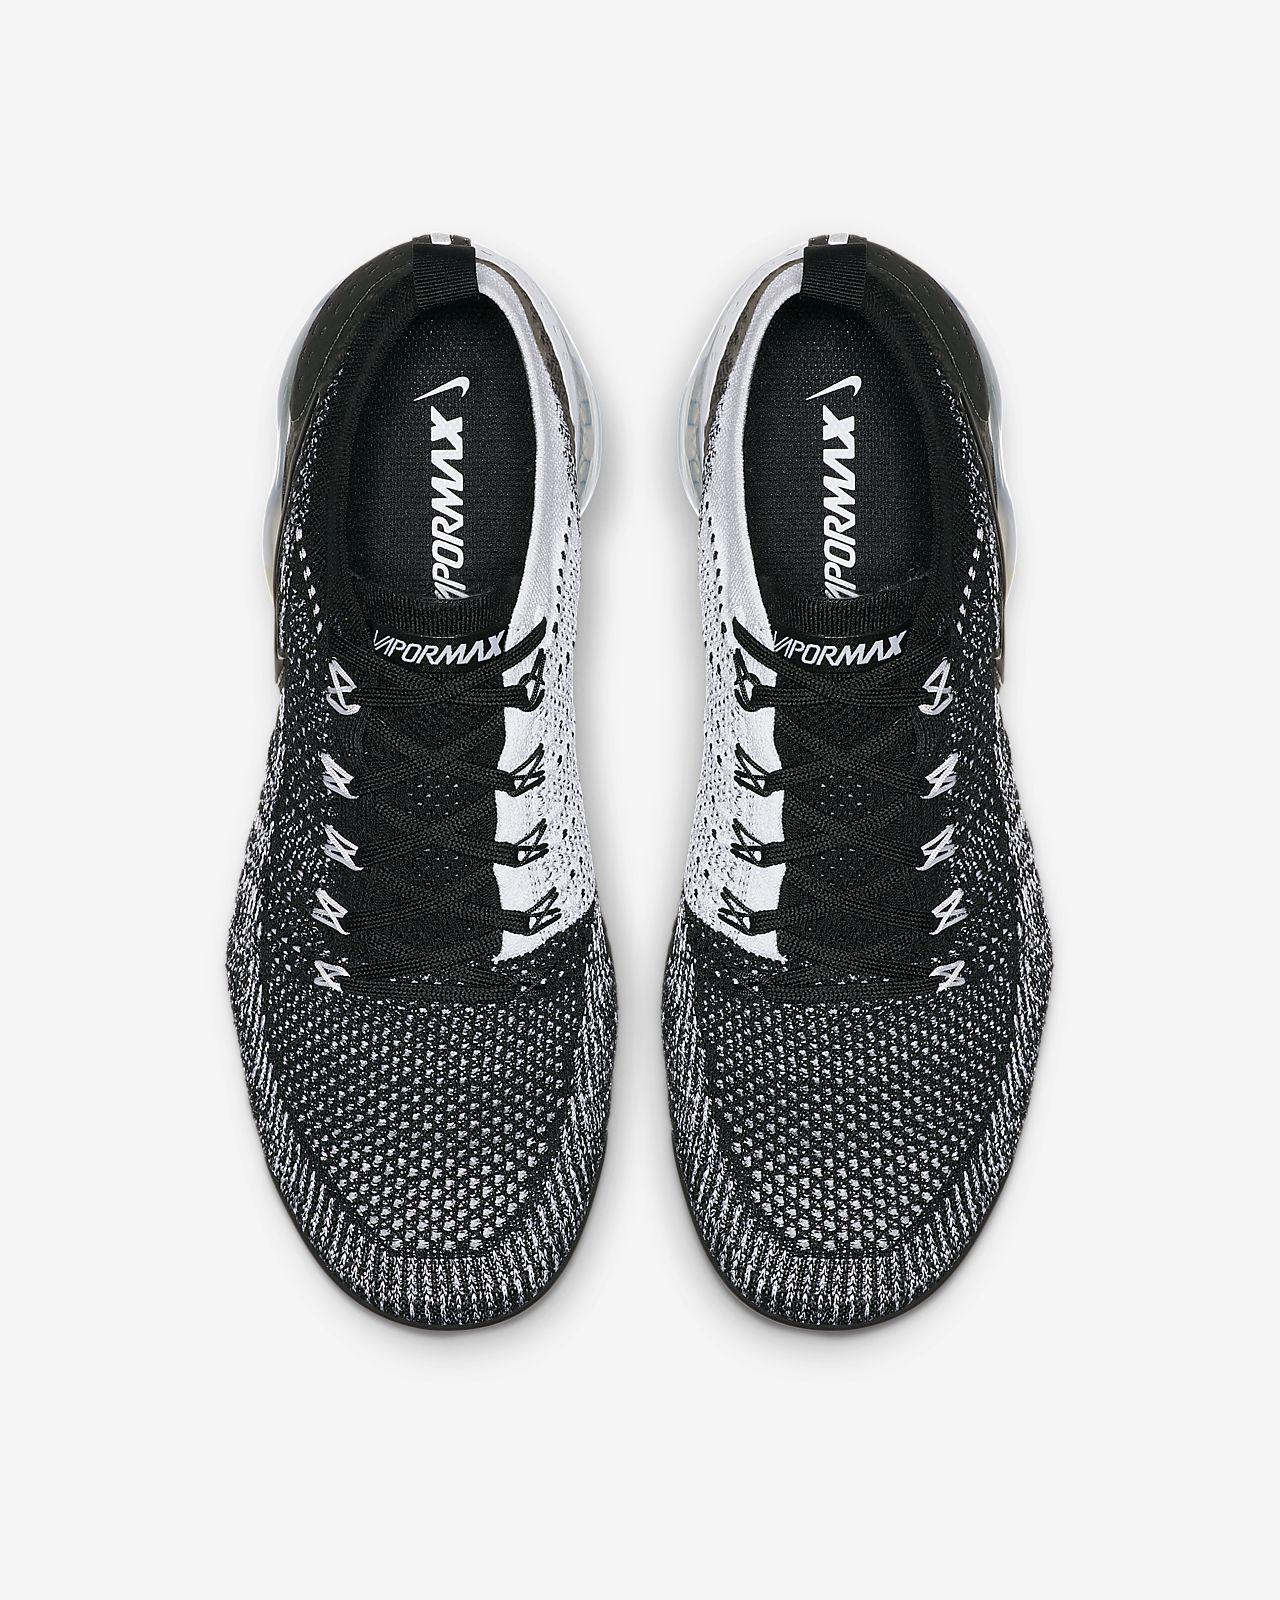 promo code 4898e 055d6 ... Nike Air VaporMax Flyknit 2 Shoe